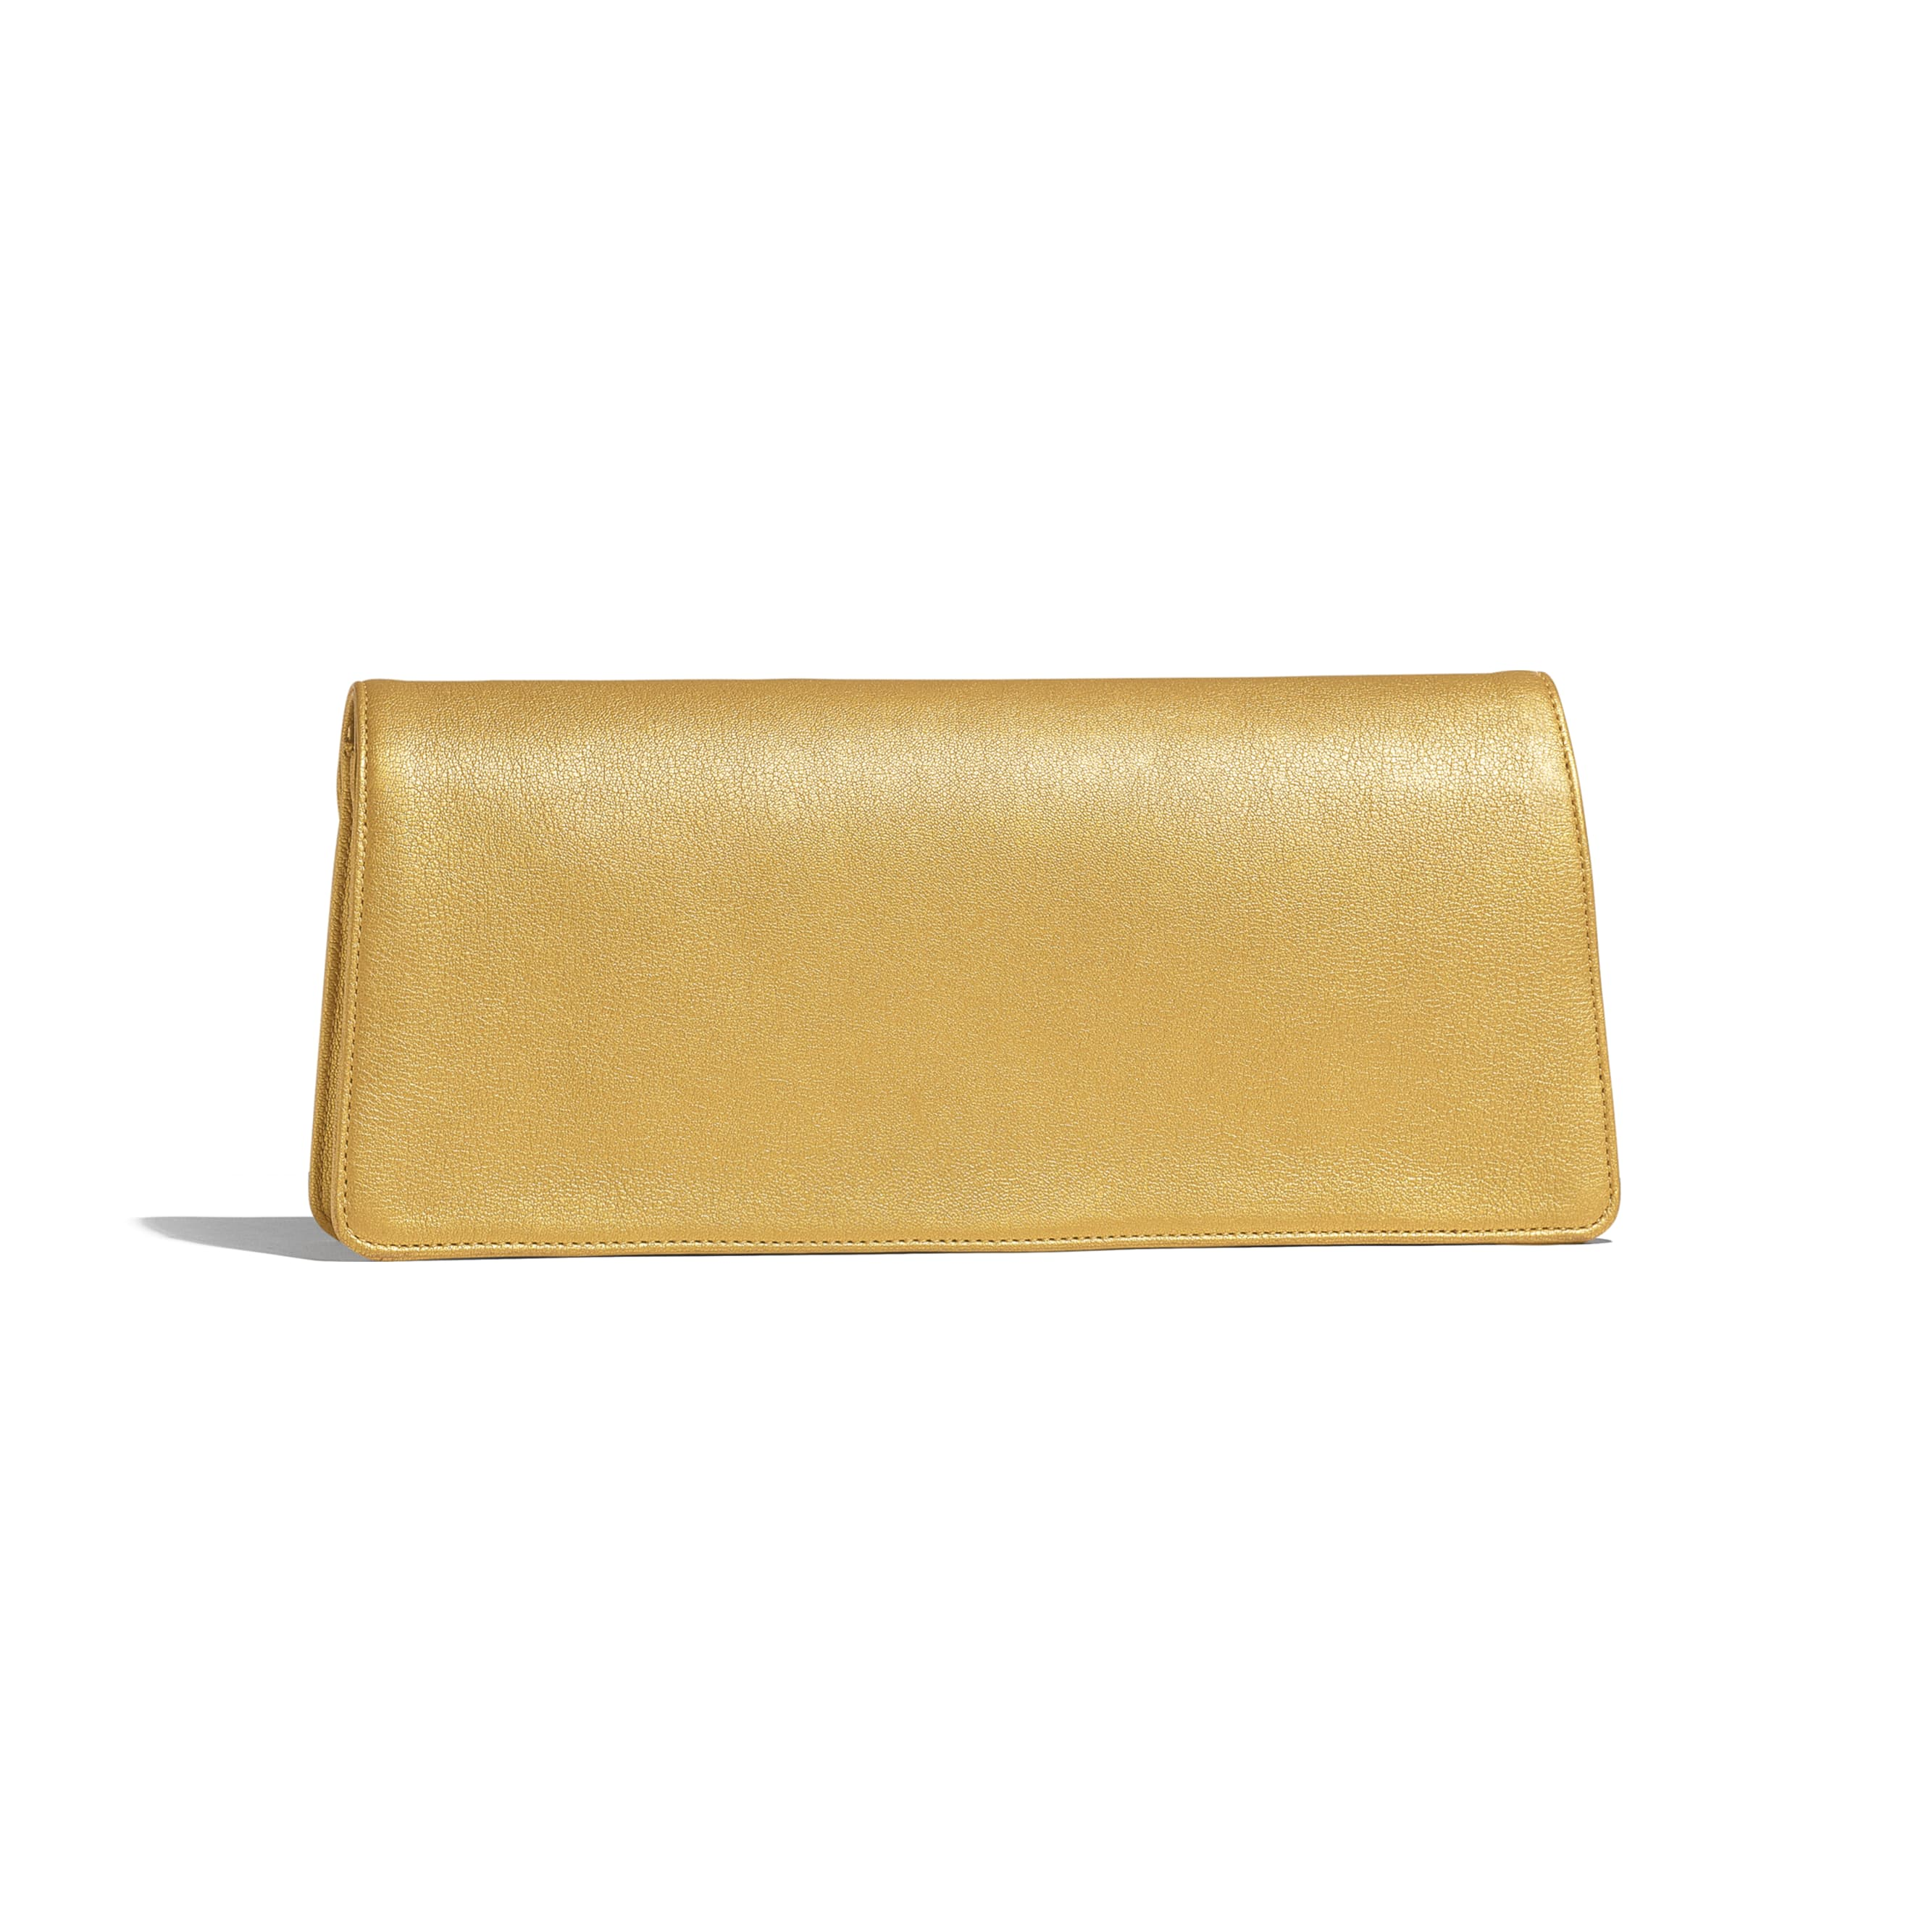 Clutch - Gold - Metallic Lambskin & Gold-Tone Metal - Alternative view - see standard sized version